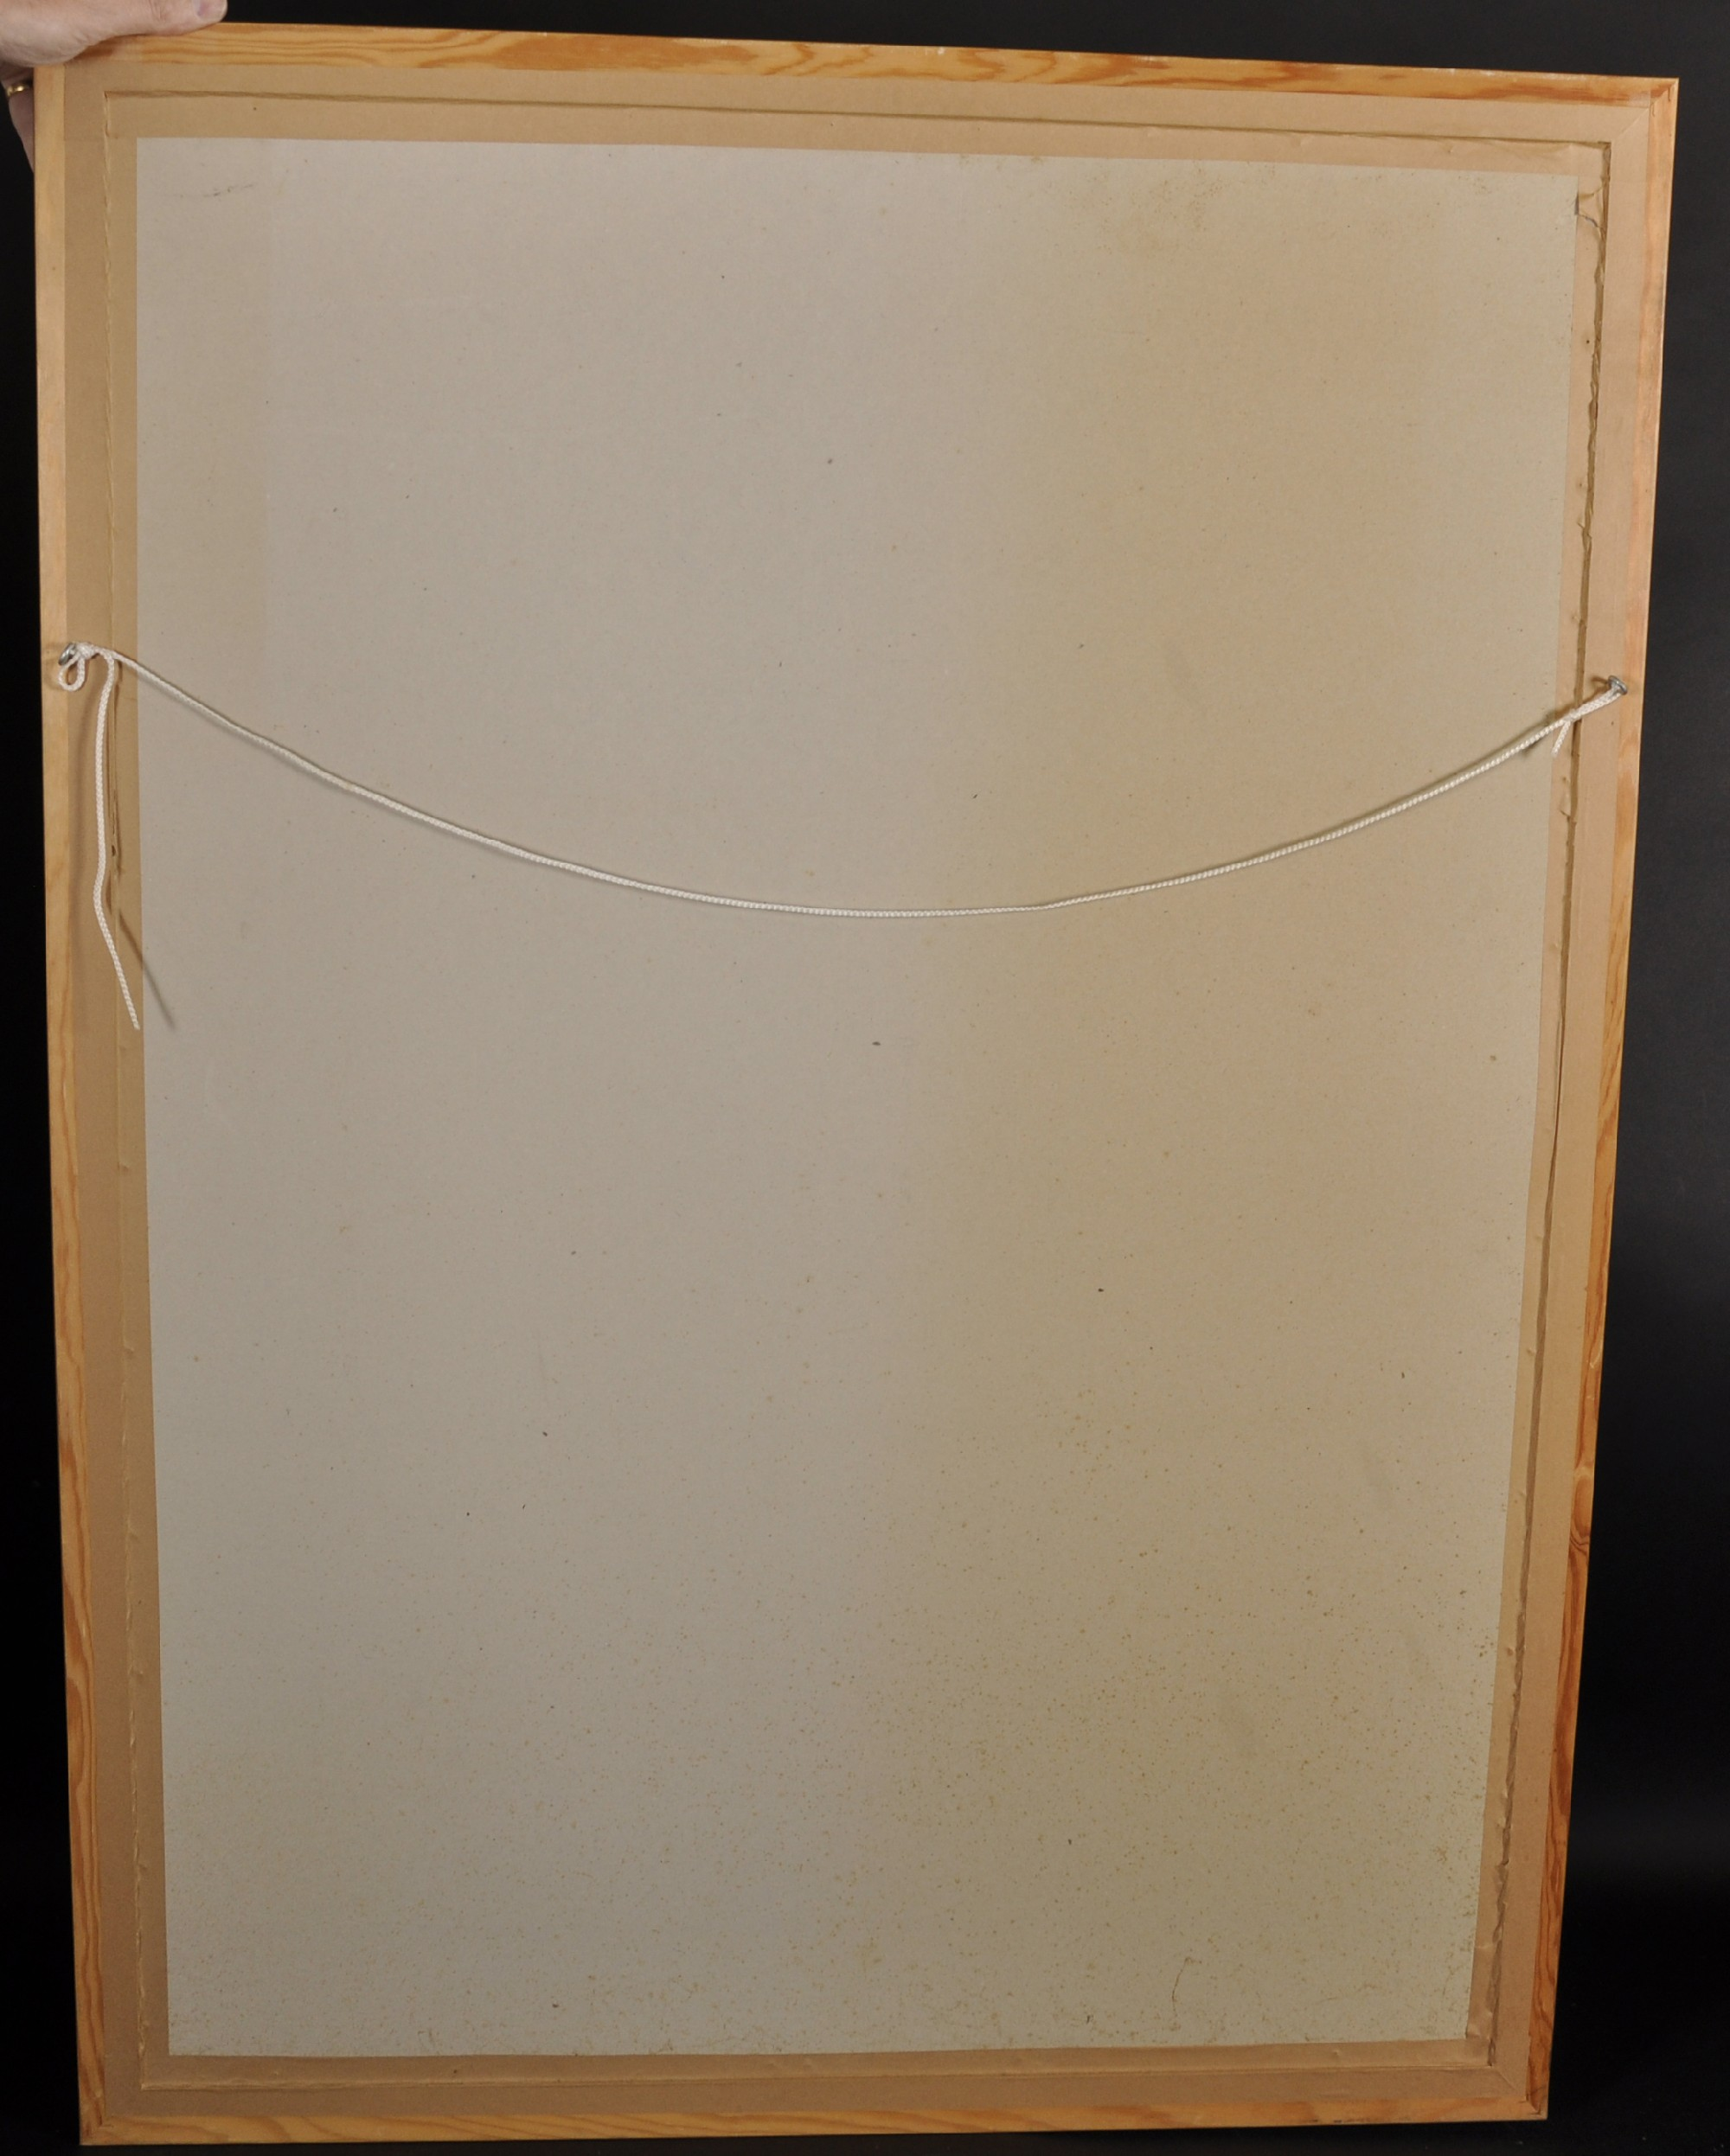 Lot 30 - 20th Century English School. Study of Orangery Doors with Broken Panes, Print, Indistinctly